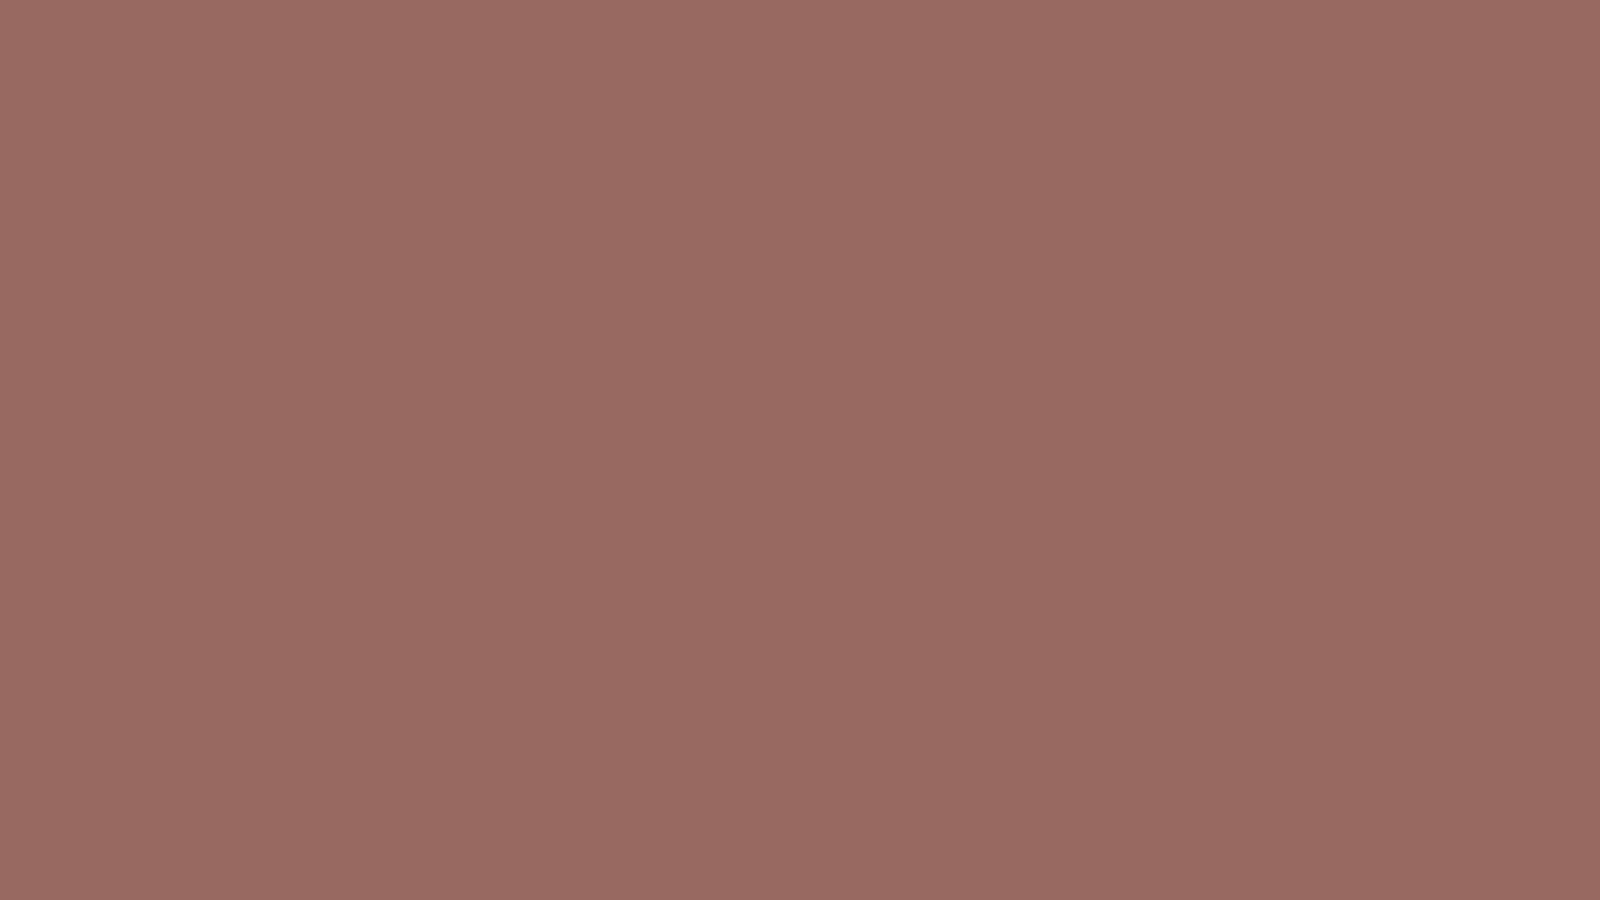 1600x900 Dark Chestnut Solid Color Background